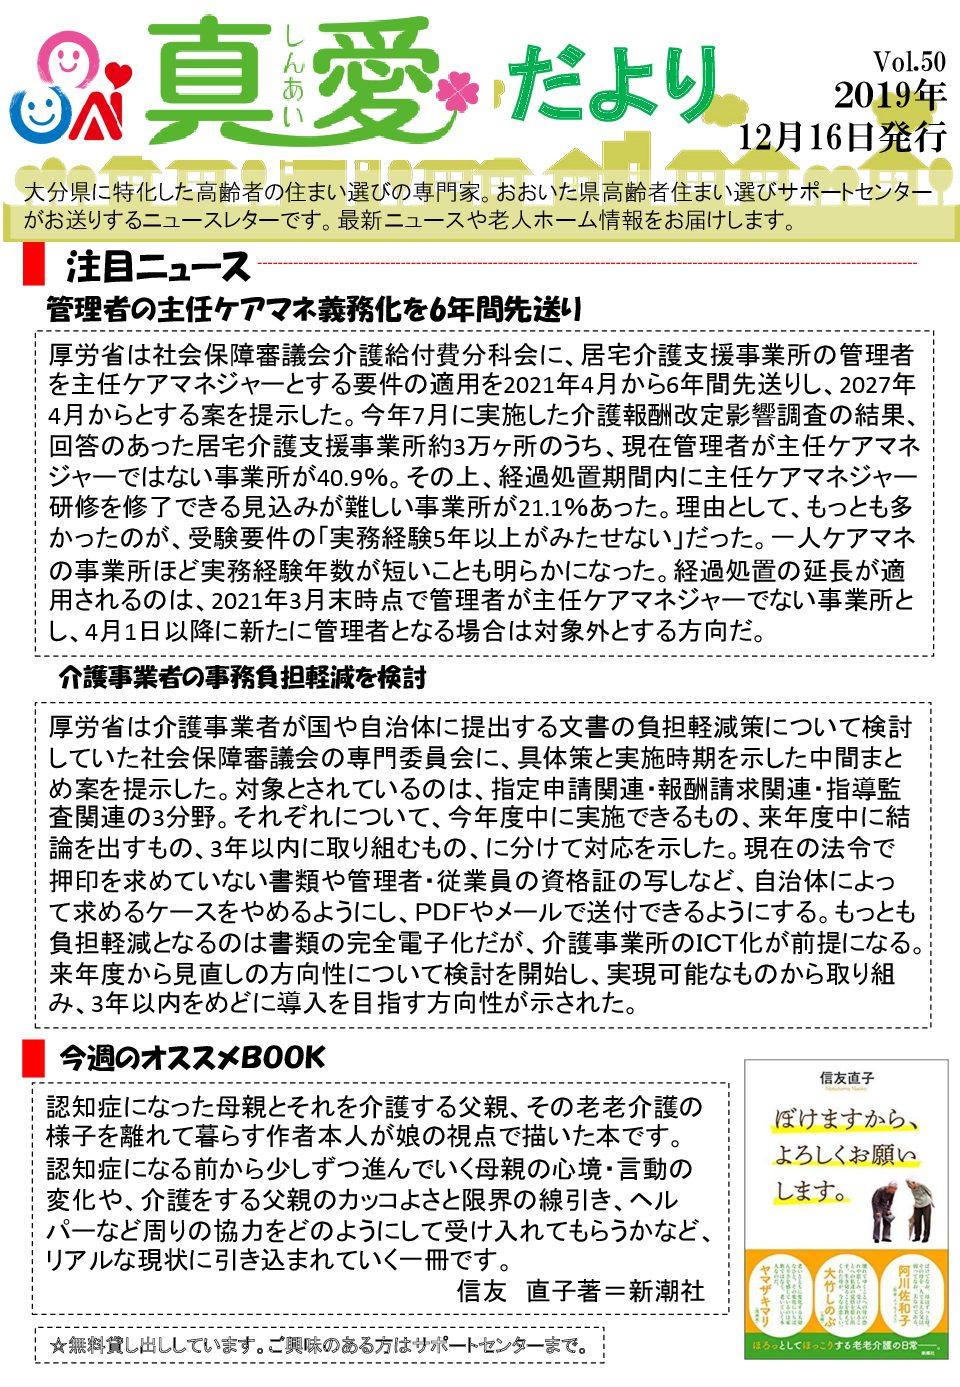 【Vol.50】 2019.12.16発行